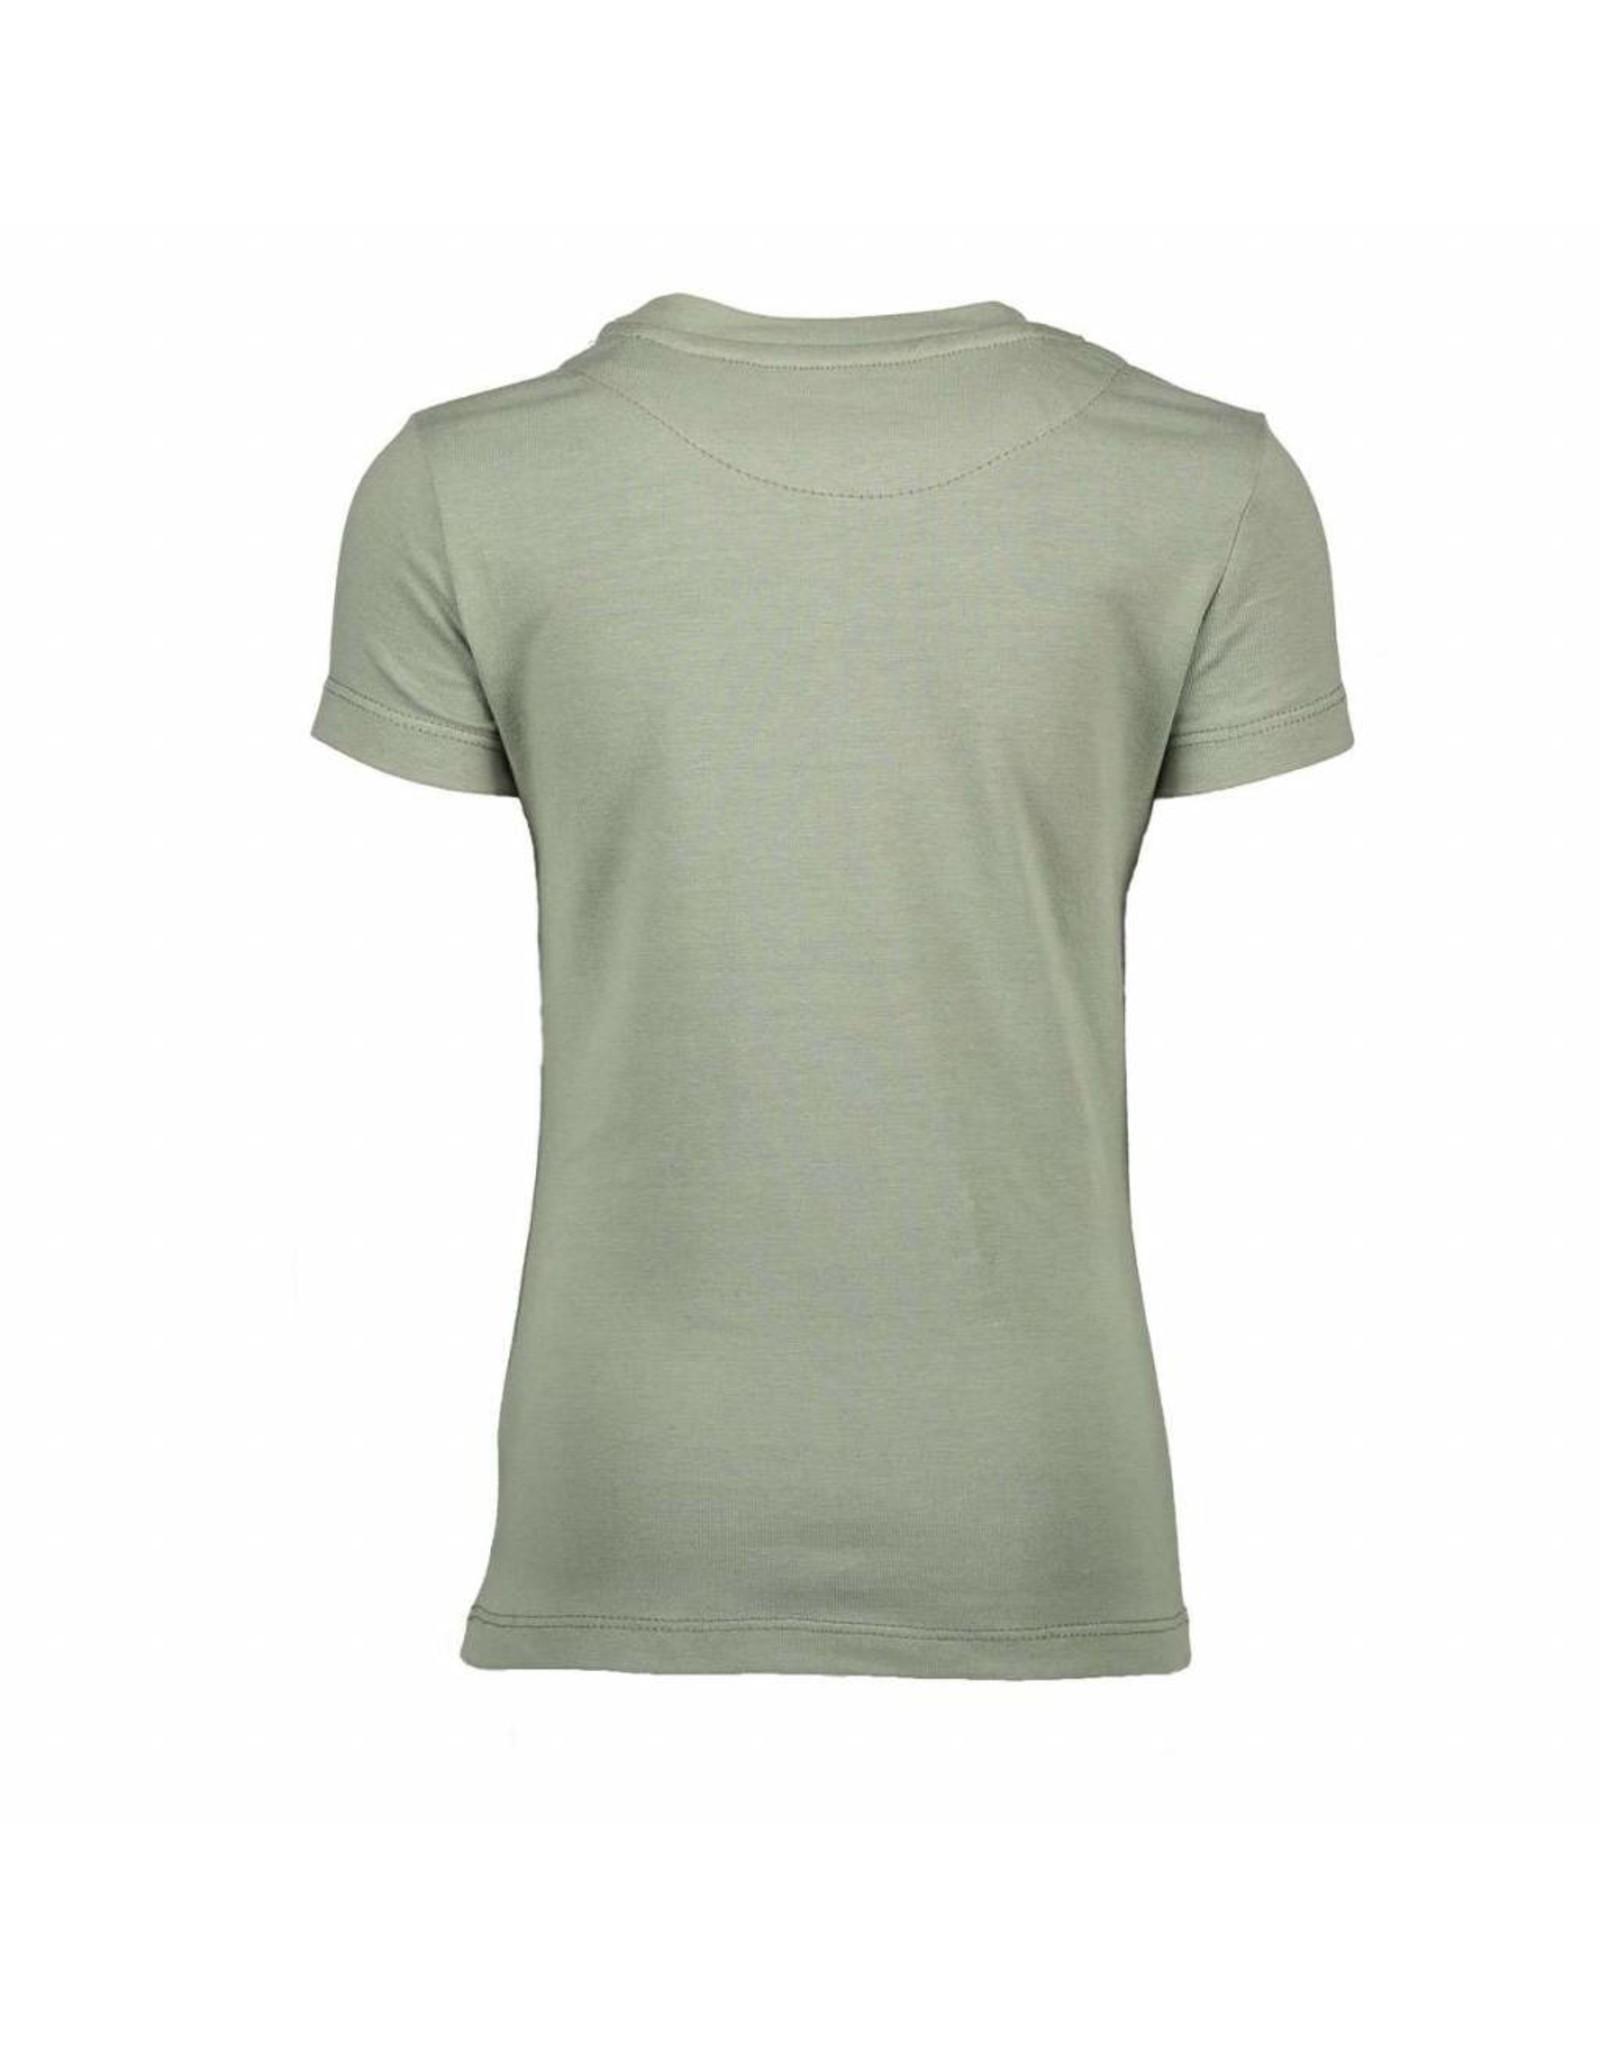 Moodsteet Darlin Moodstreet Darlin T-shirt Chest Artwork Army